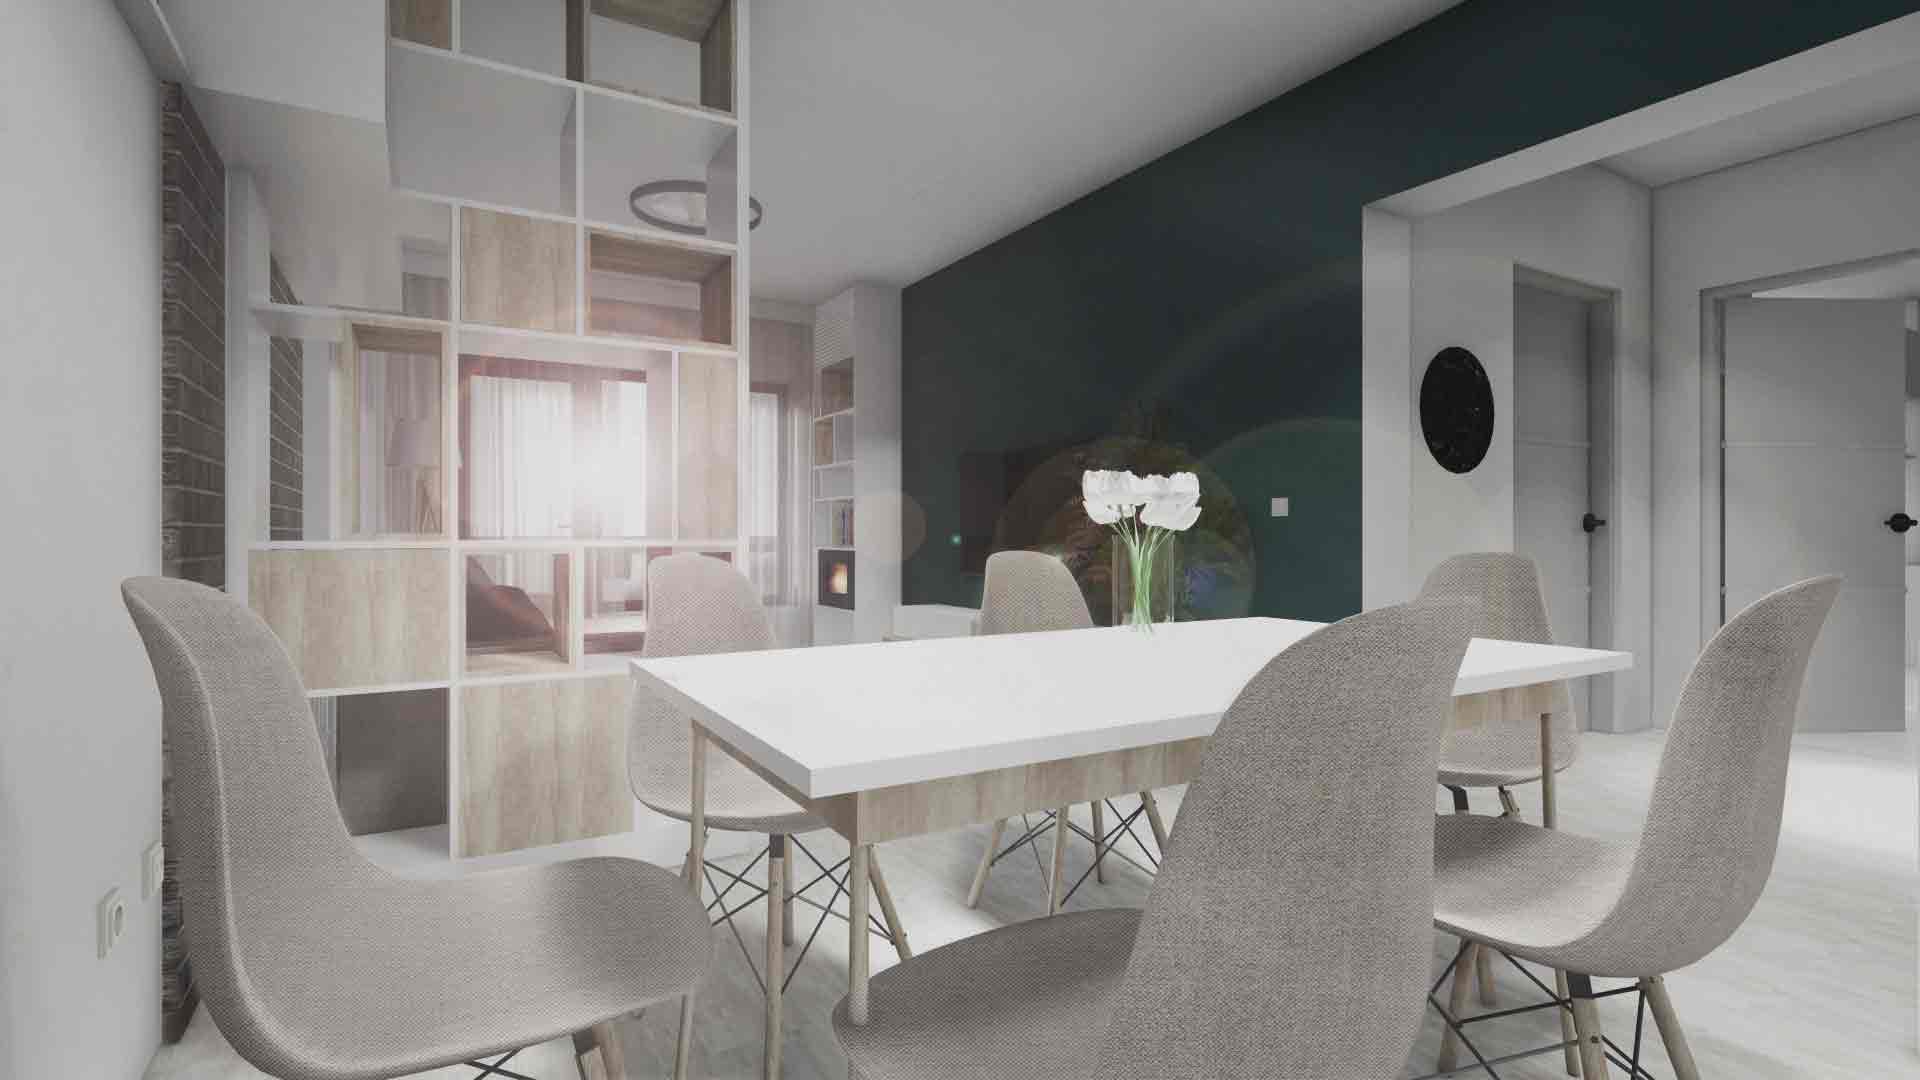 amenajare interioara cu loc de luat masa in living